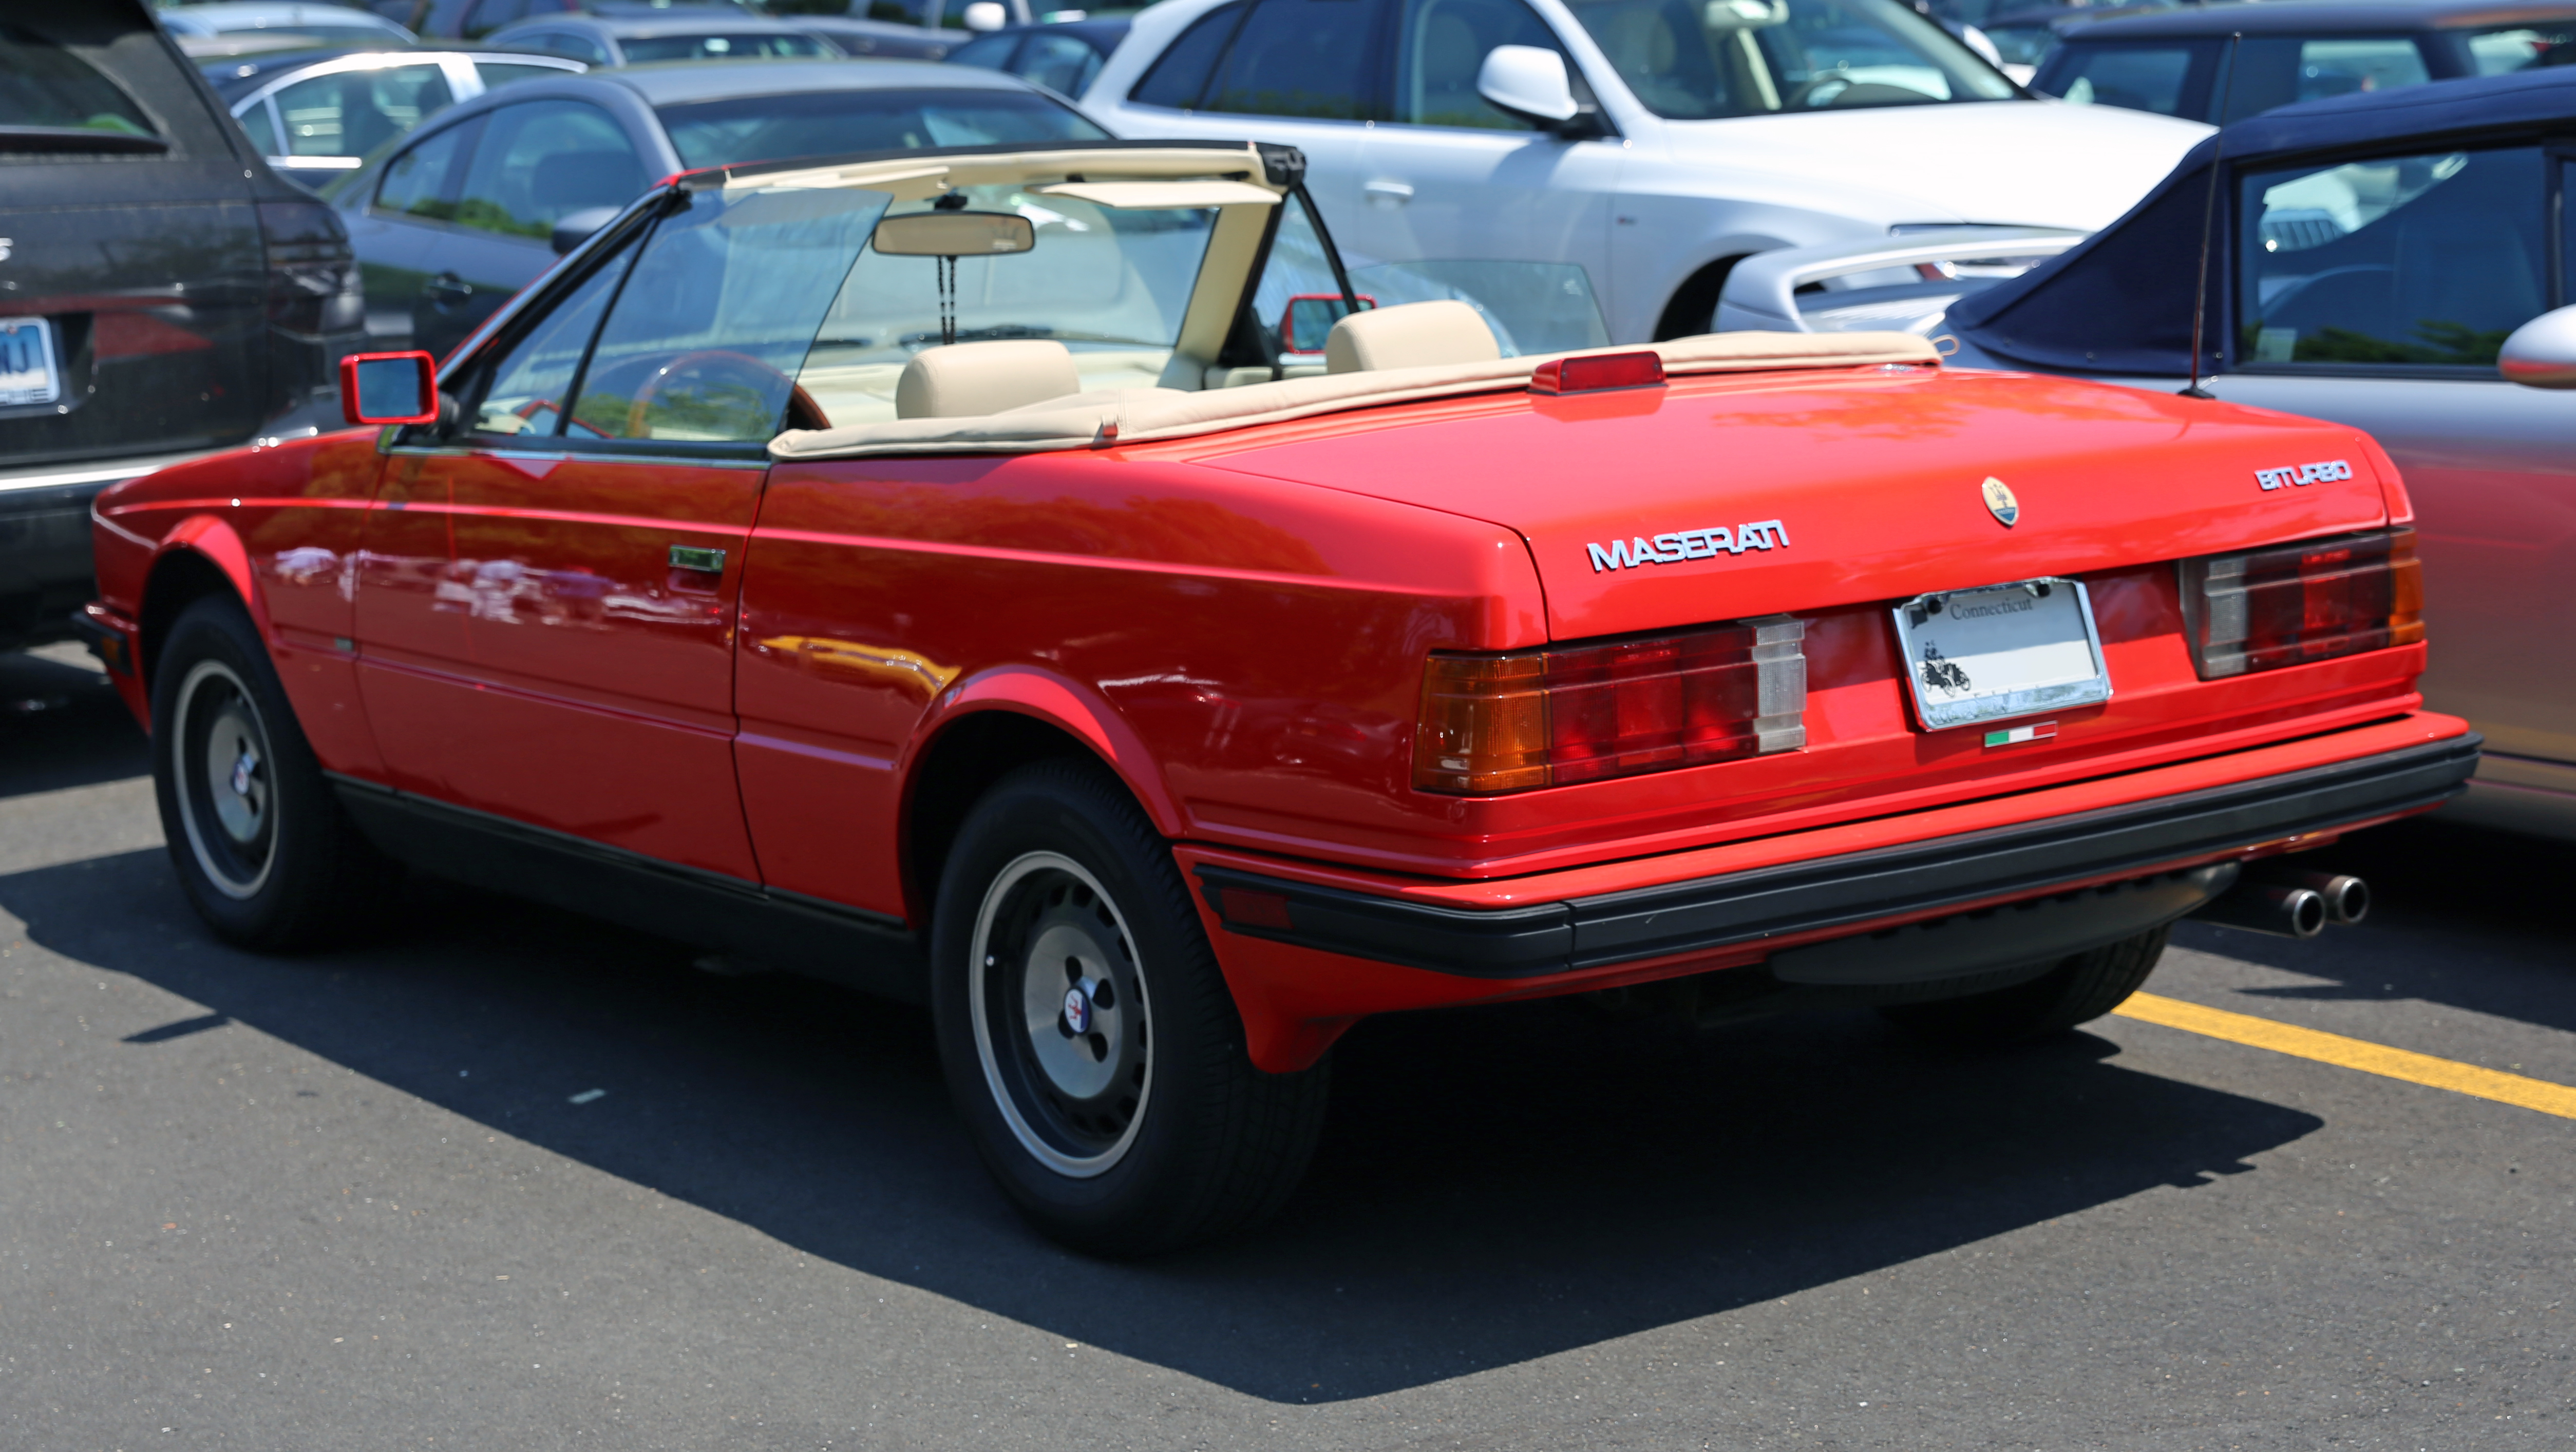 Maserati Biturbo 1981 - 1994 Cabriolet #5